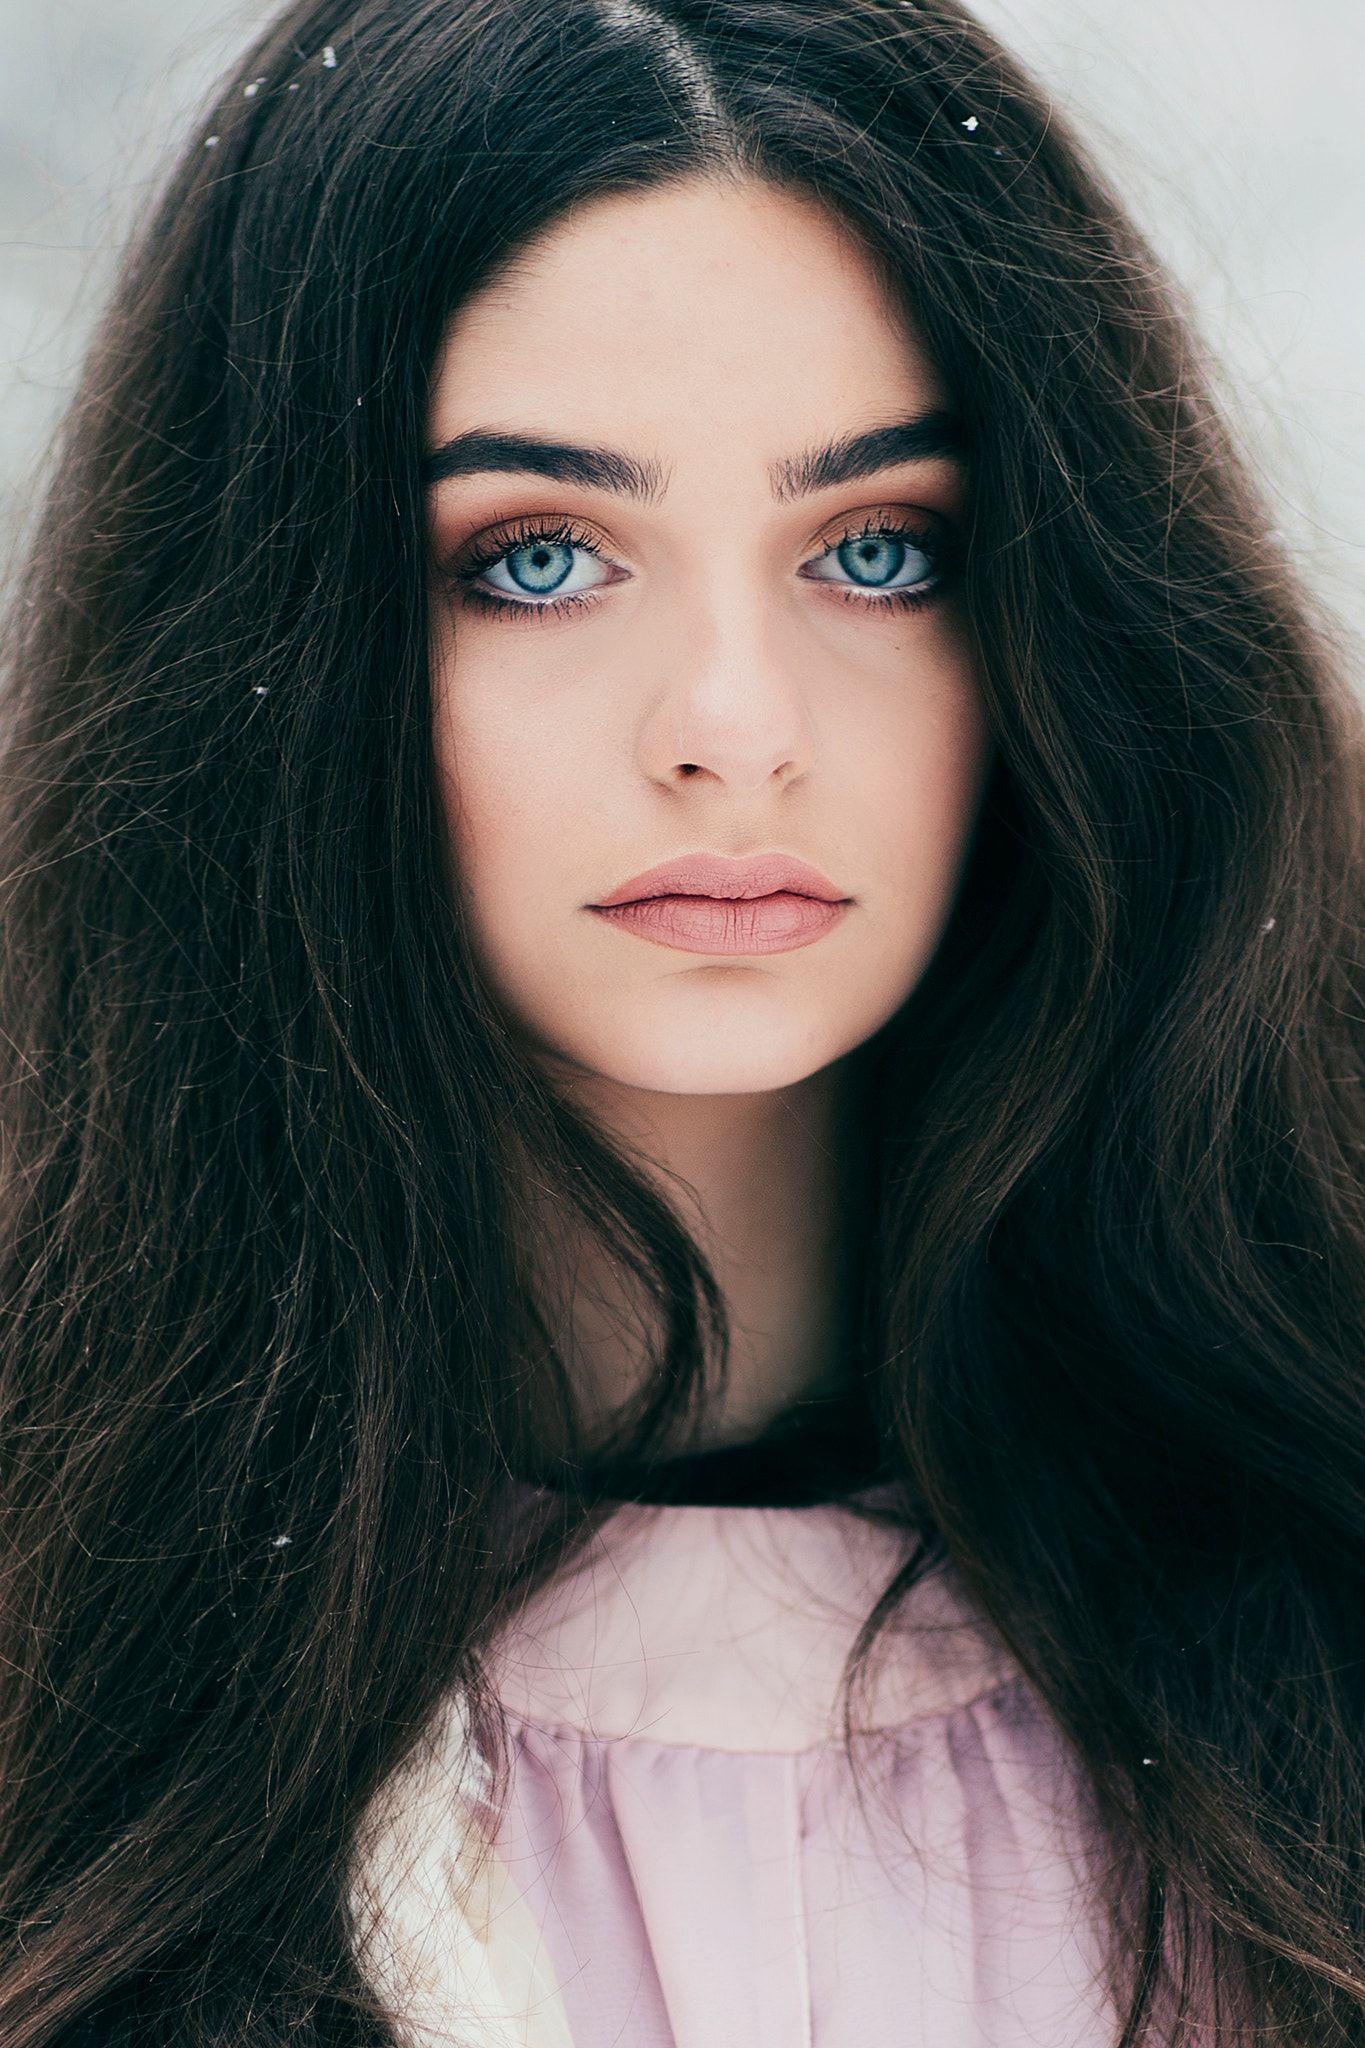 Ocean Blue Eyes Black Hair Blue Eyes Dark Hair Blue Eyes Black Hair Blue Eyes Girl